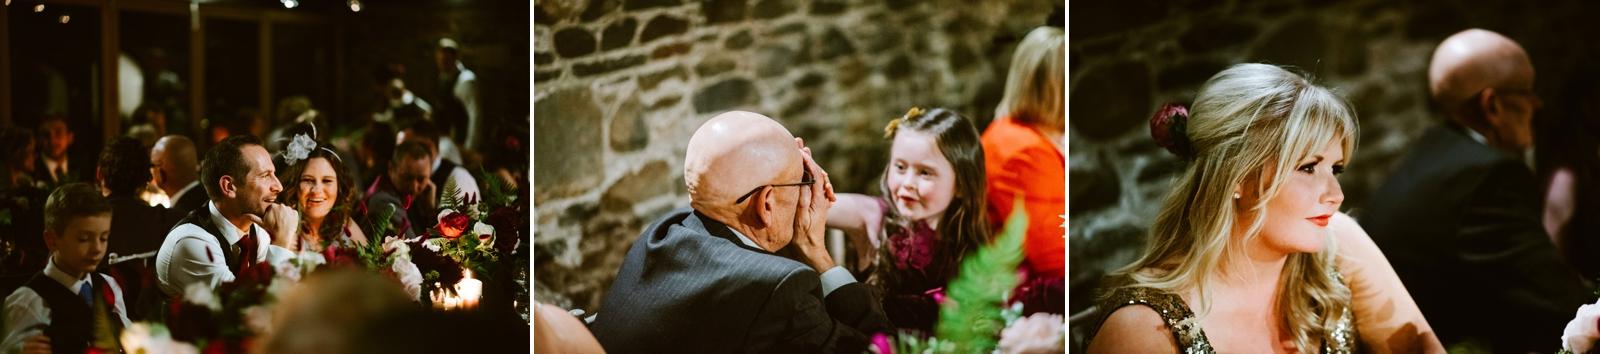 alternative-wedding-photography-scotland-katie-stephen-aikwood-tower-452.jpg